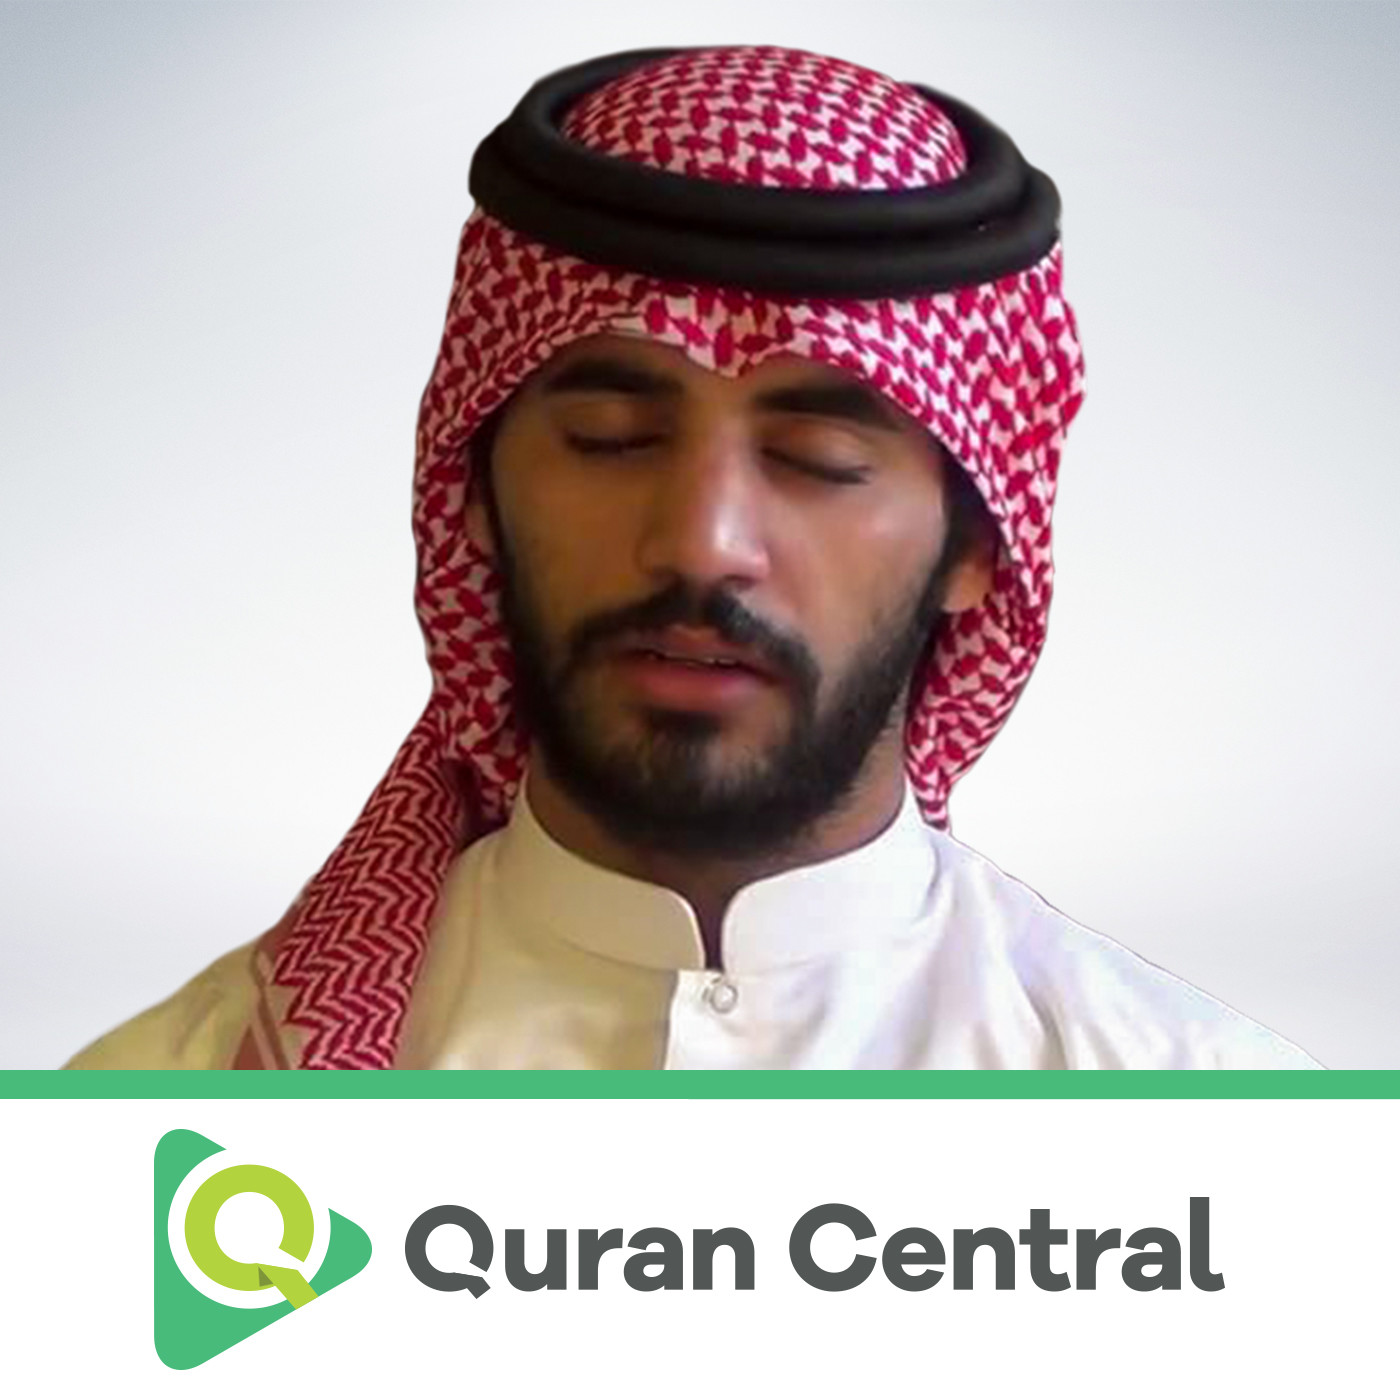 Muhammad Taha Al Junaid • Quran Audio • Quran Central • Podcasts